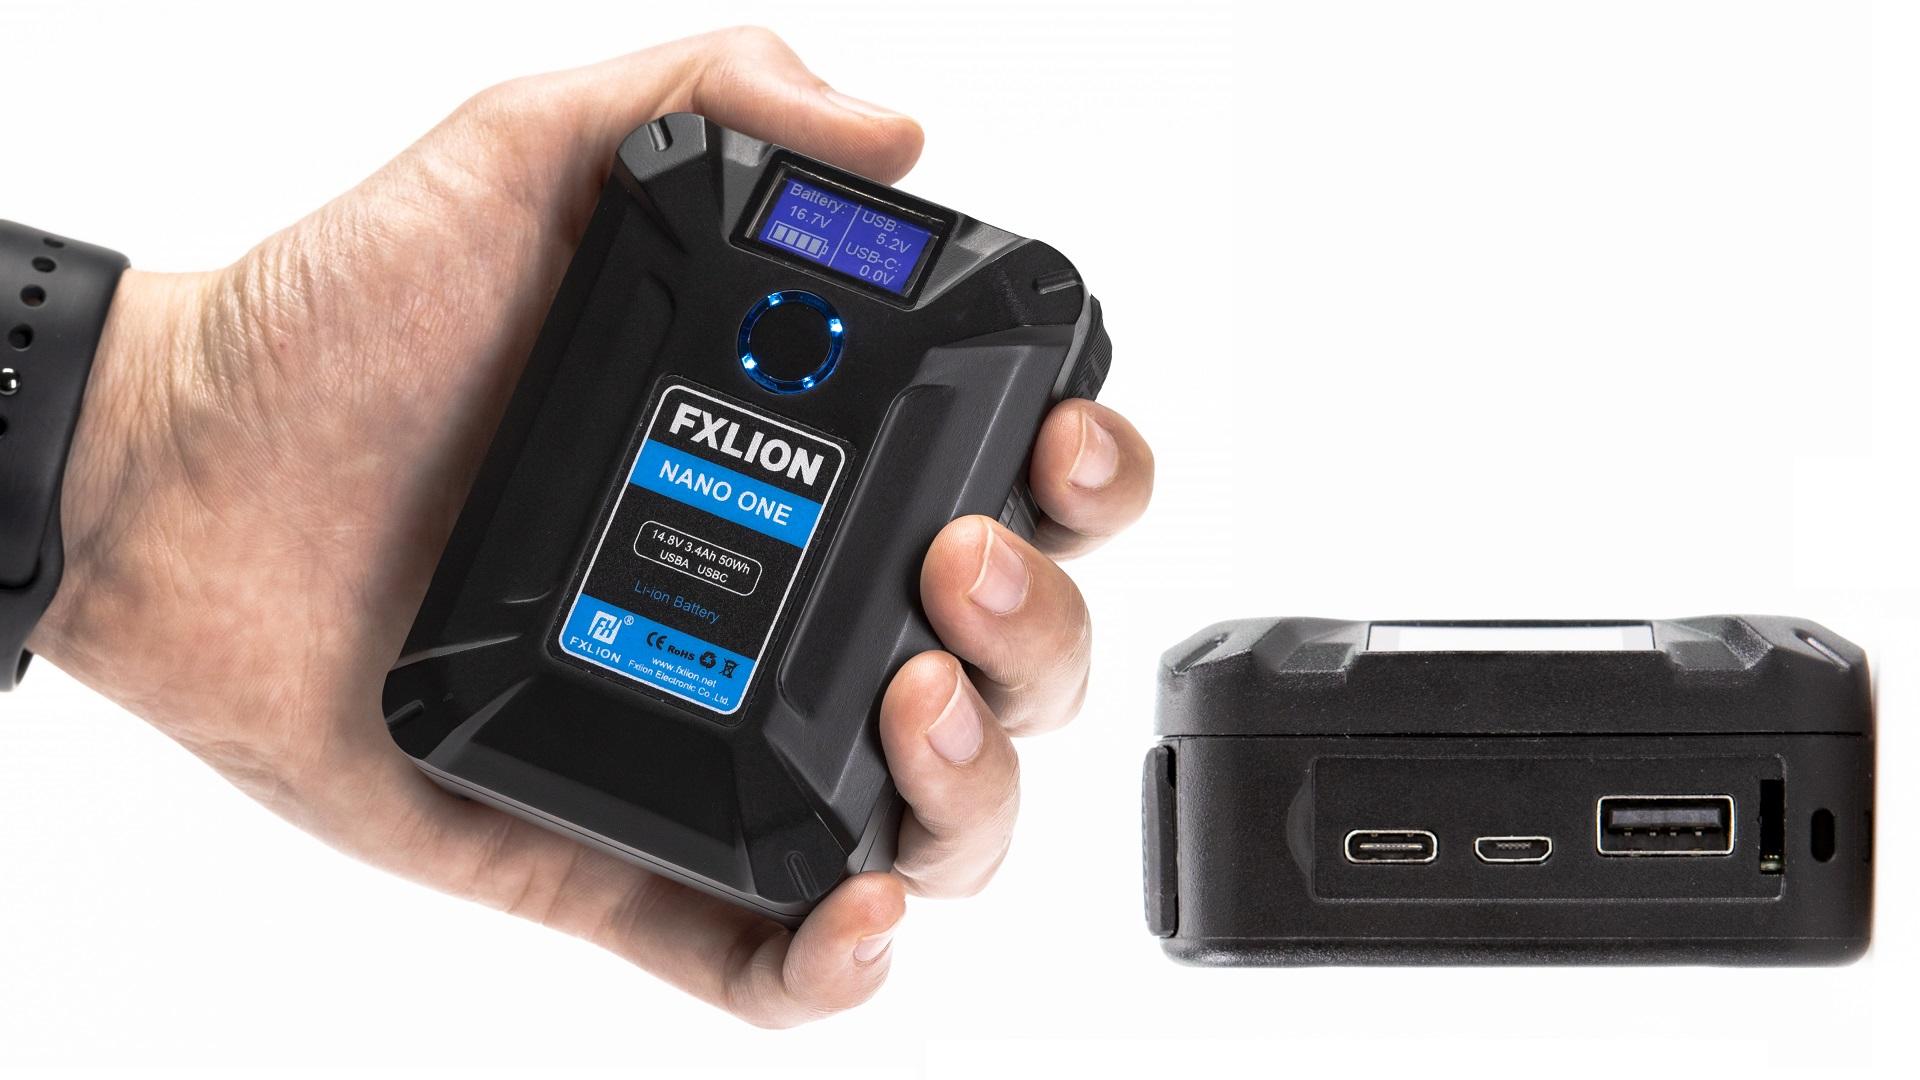 FxlionがNANO ONEを発売 - 50Wh V-Lockバッテリー